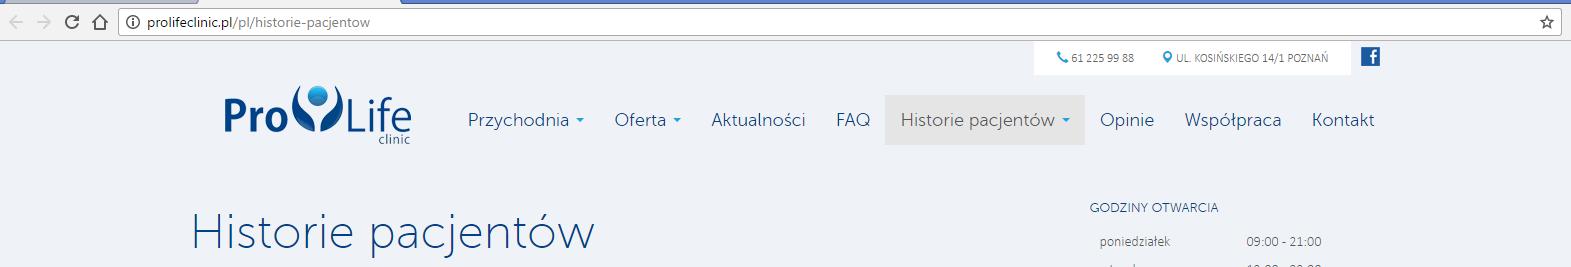 Świadectwa par na temat Naprotechnologii ze strony prolifeclinic.pl